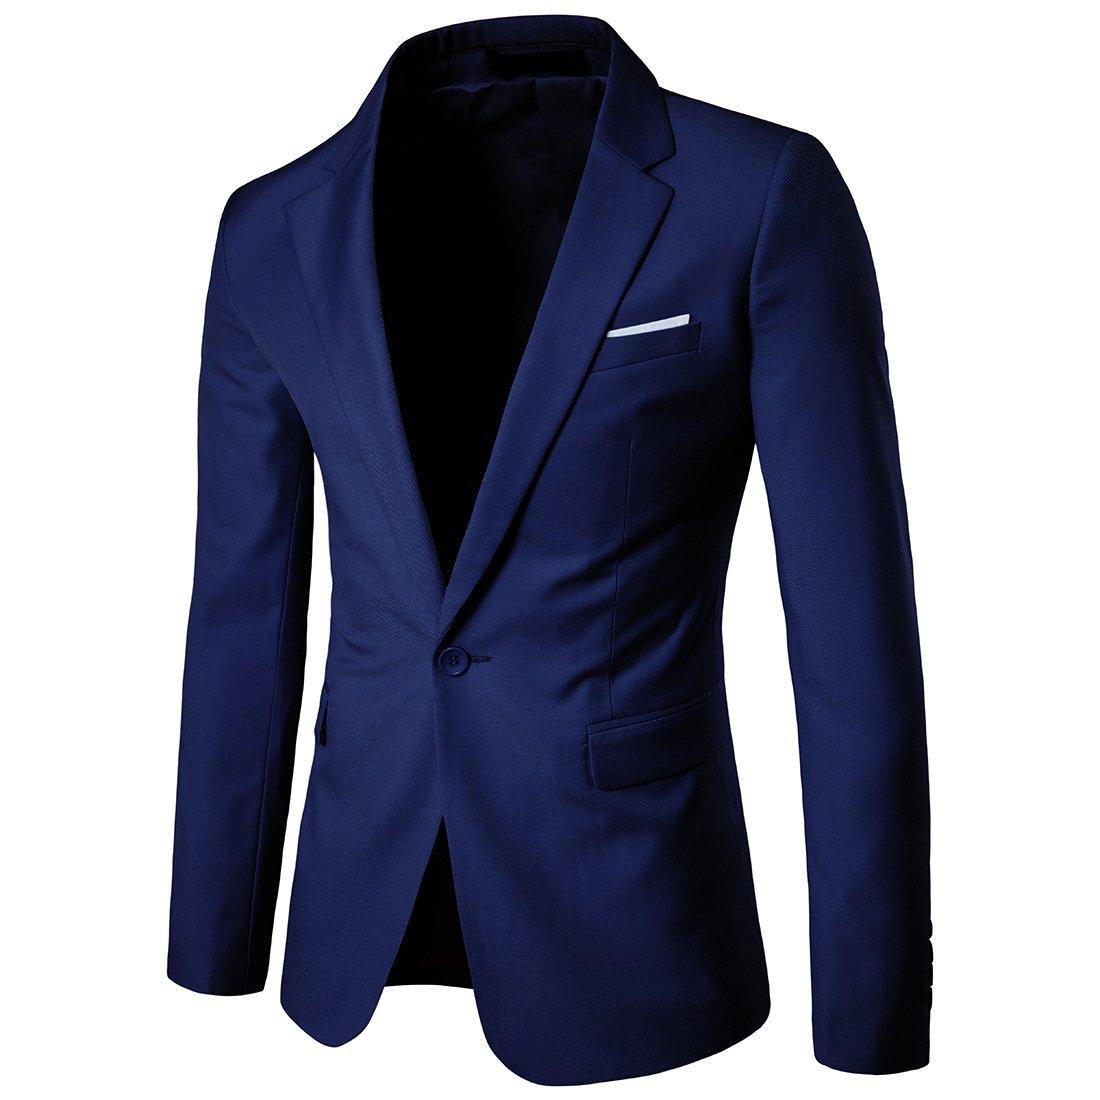 Cloudstyle Men's Suit Jacket One Button Slim Fit Sport Coat Business Daily Blazer,Navy,Medium